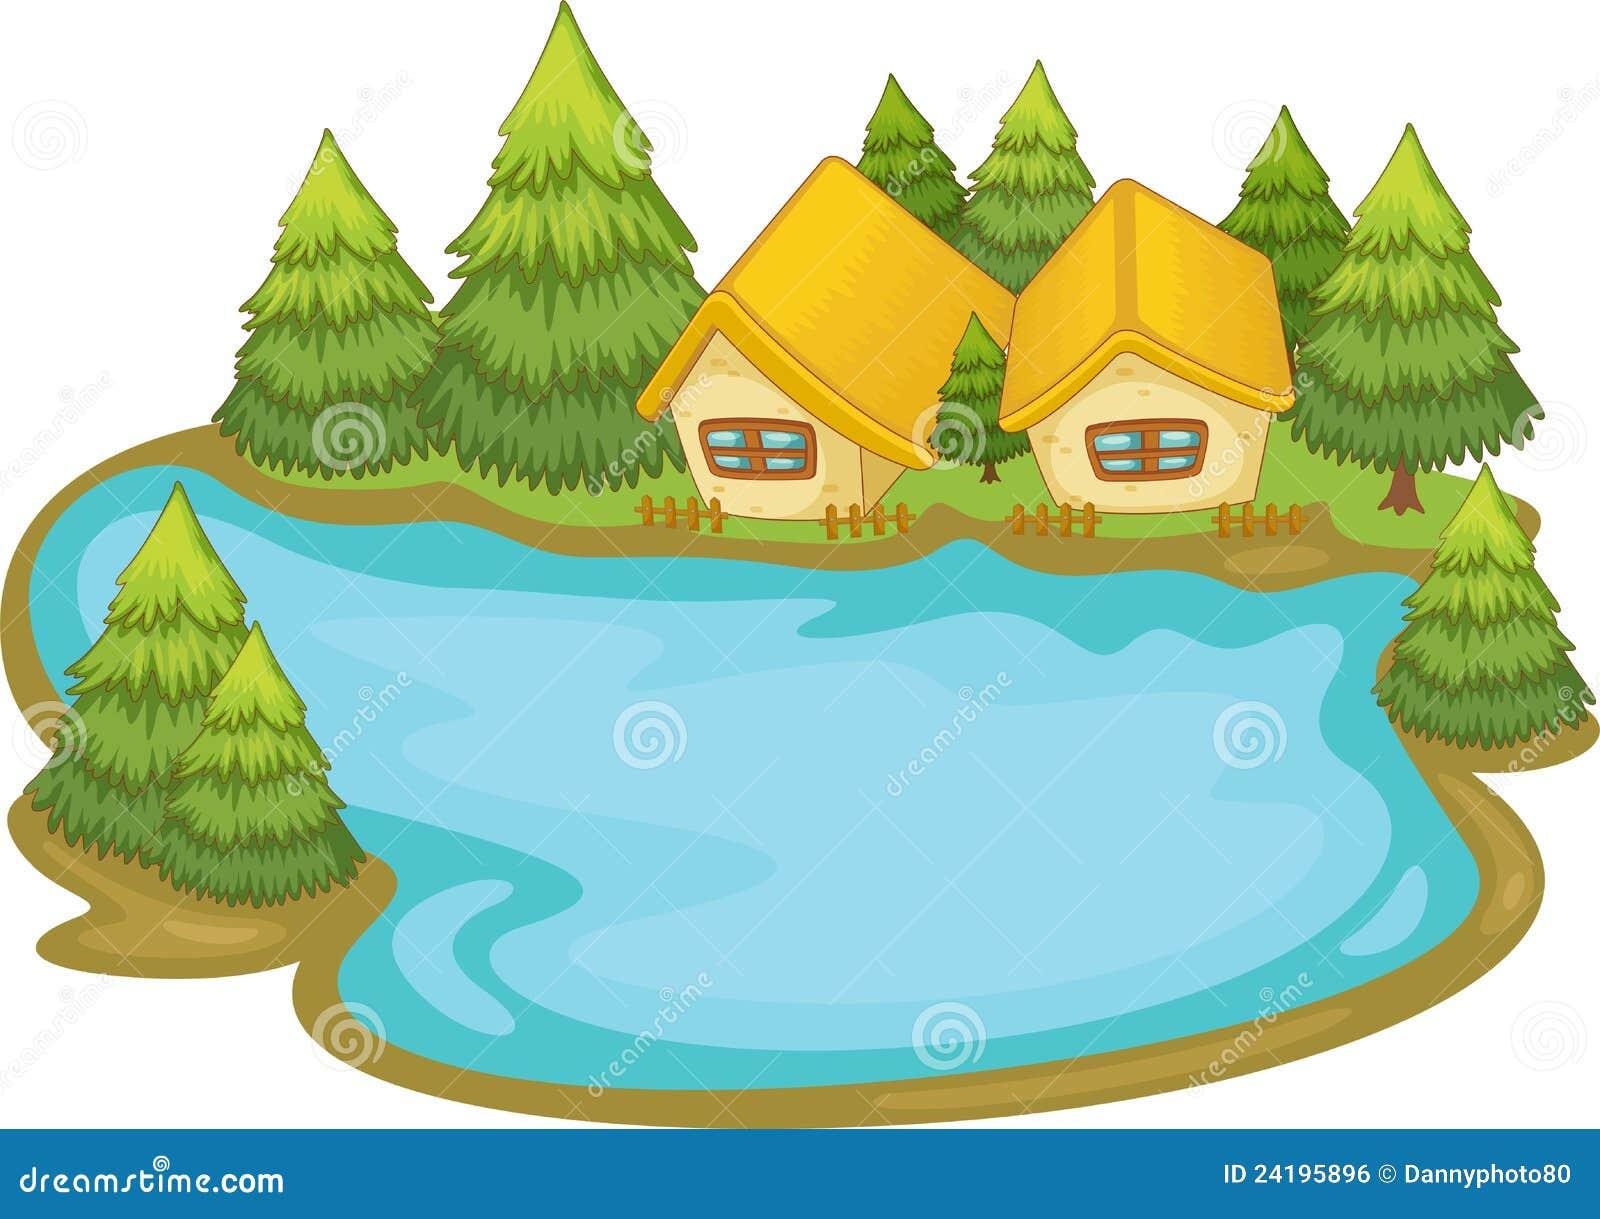 free clip art lake house - photo #7